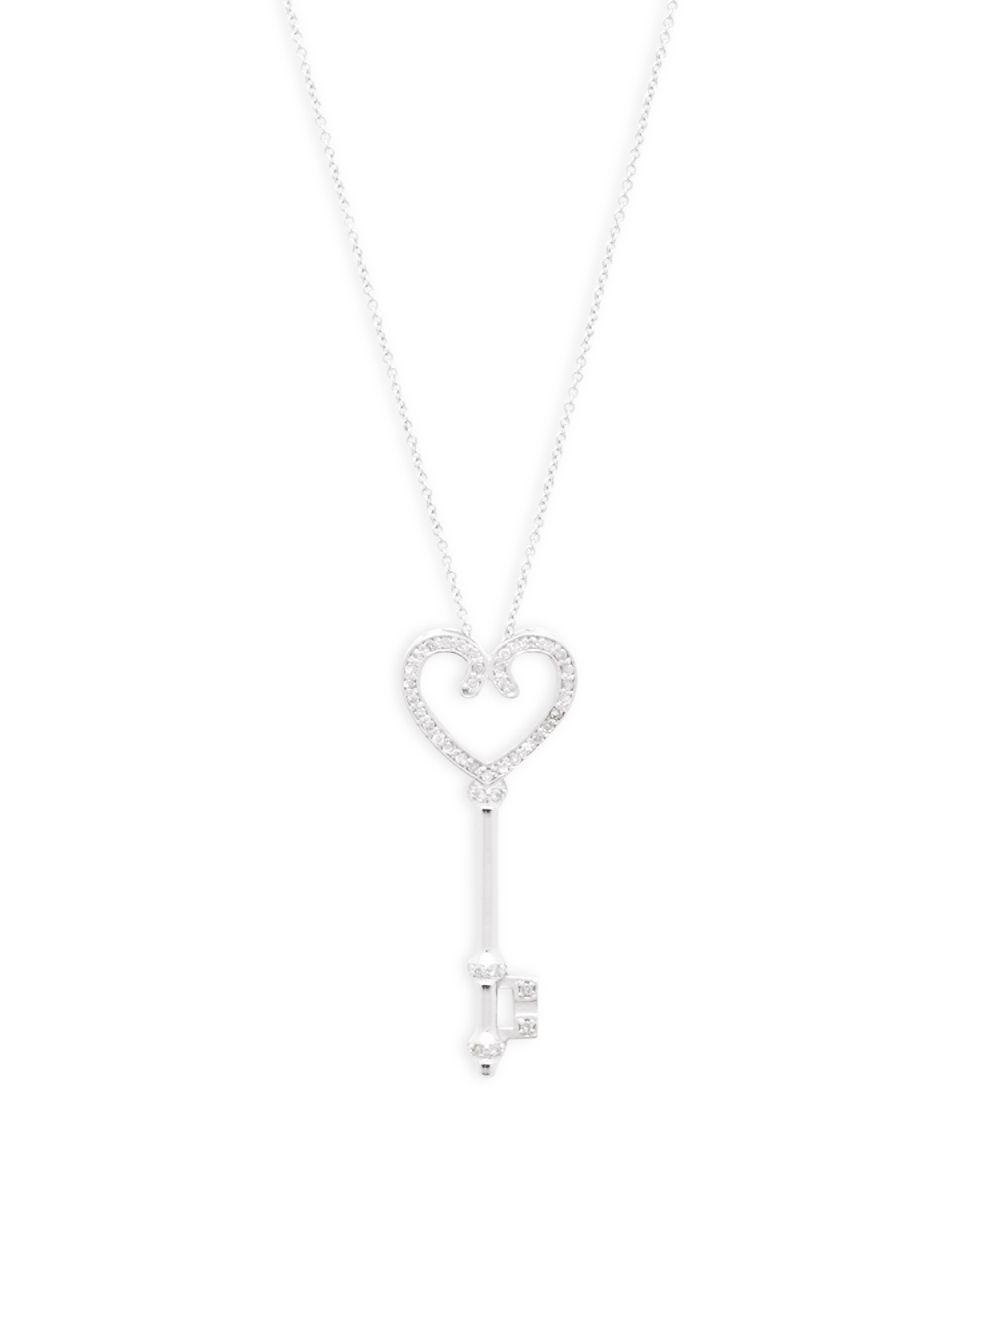 c98927d9eb1bd2 Lyst - Effy Diamond And 14k White Gold Key Pendant Necklace in Metallic